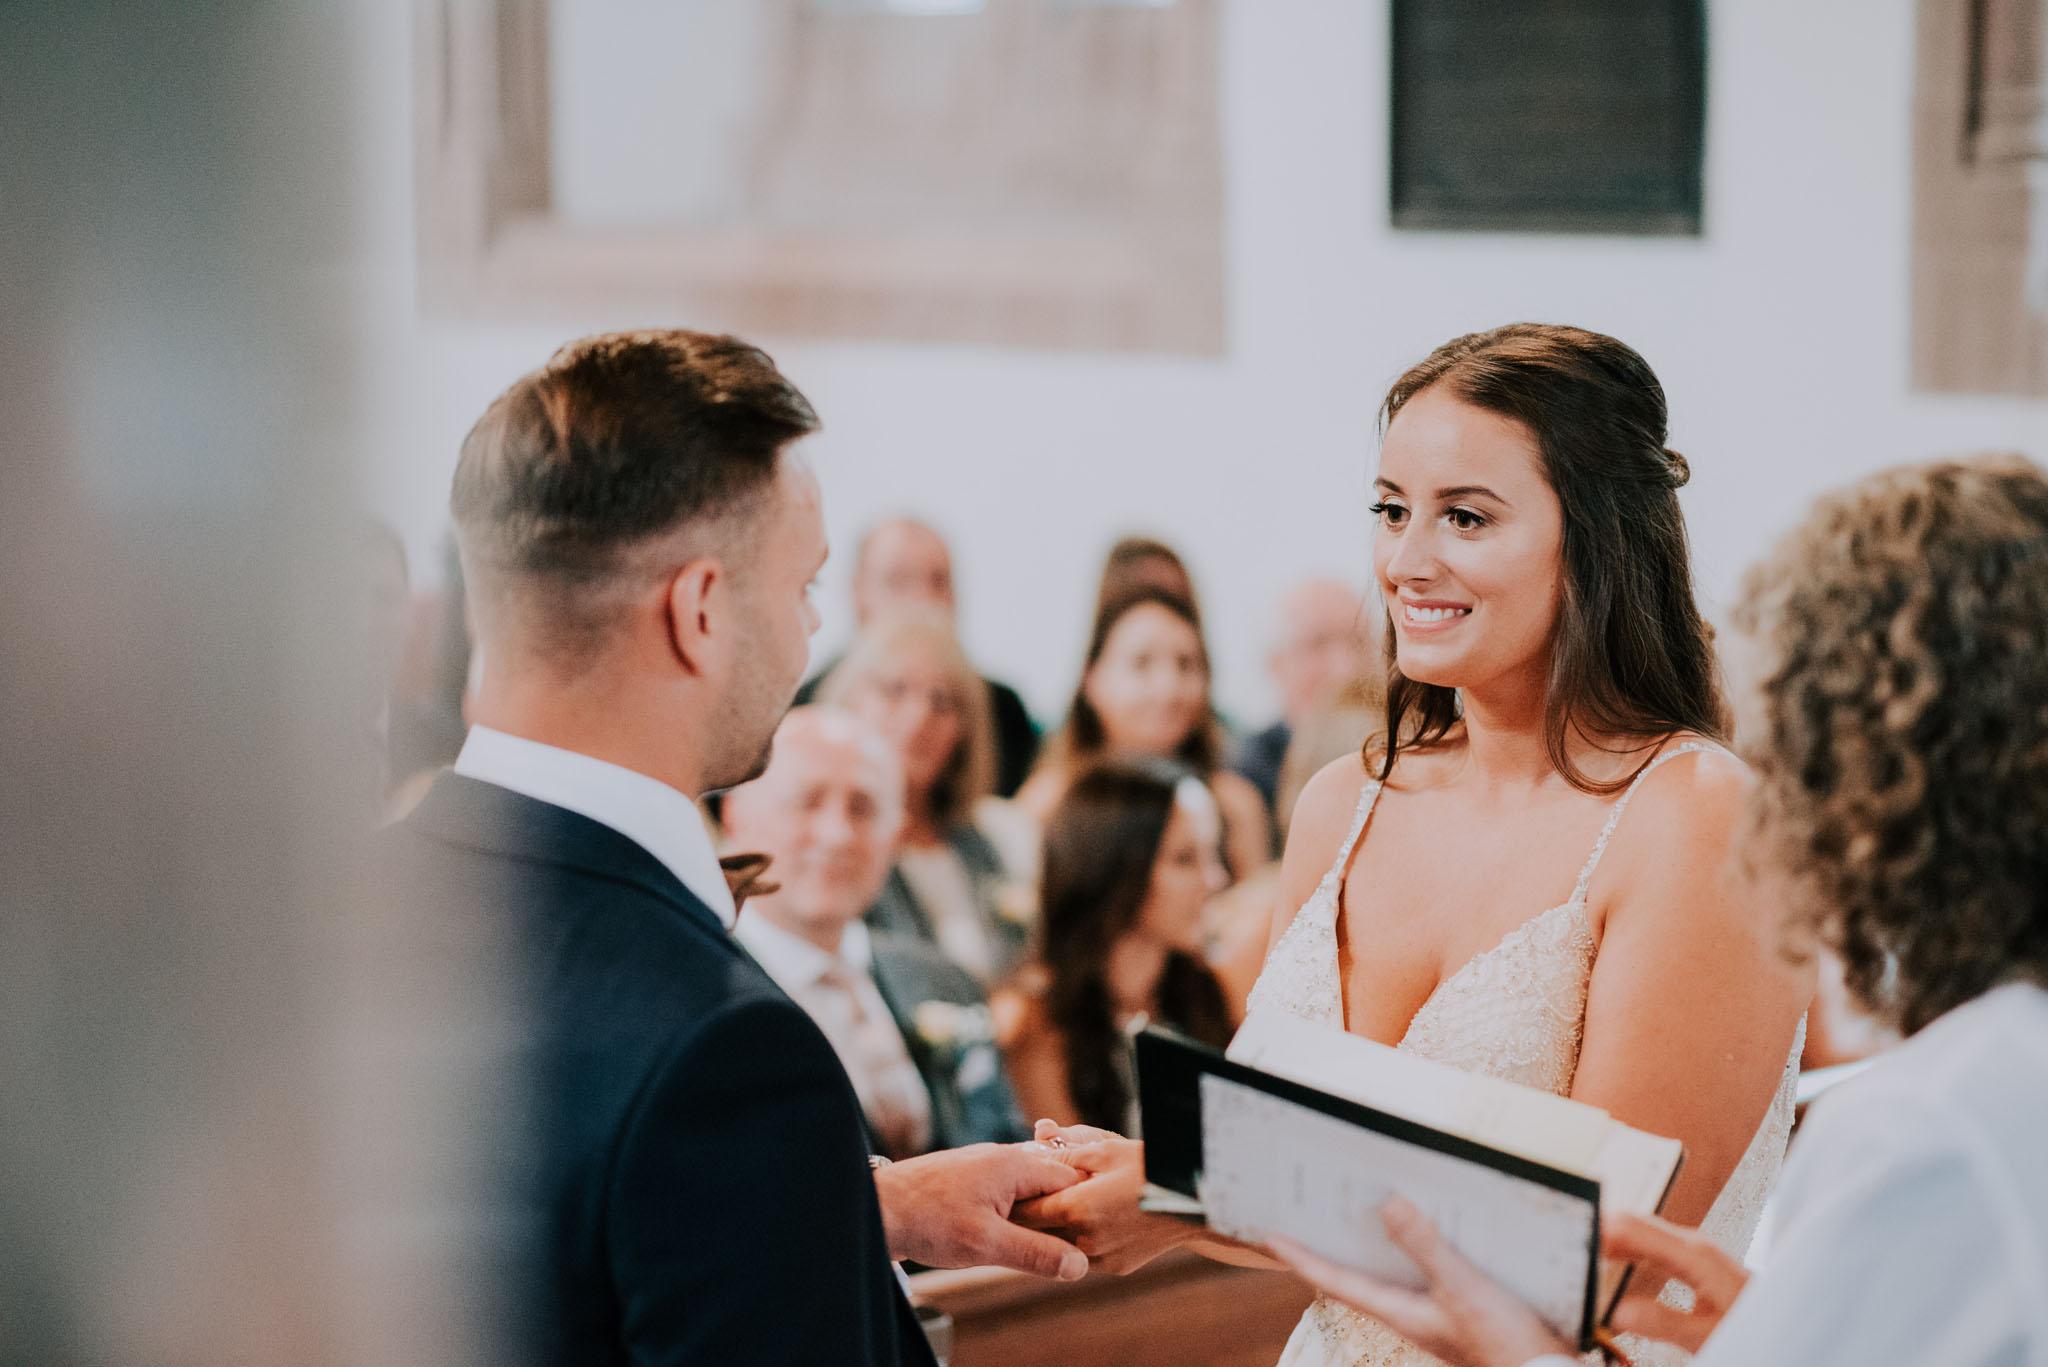 wedding-photographer-glewstone-court-hereford-scott-stockwell-photography194.jpg